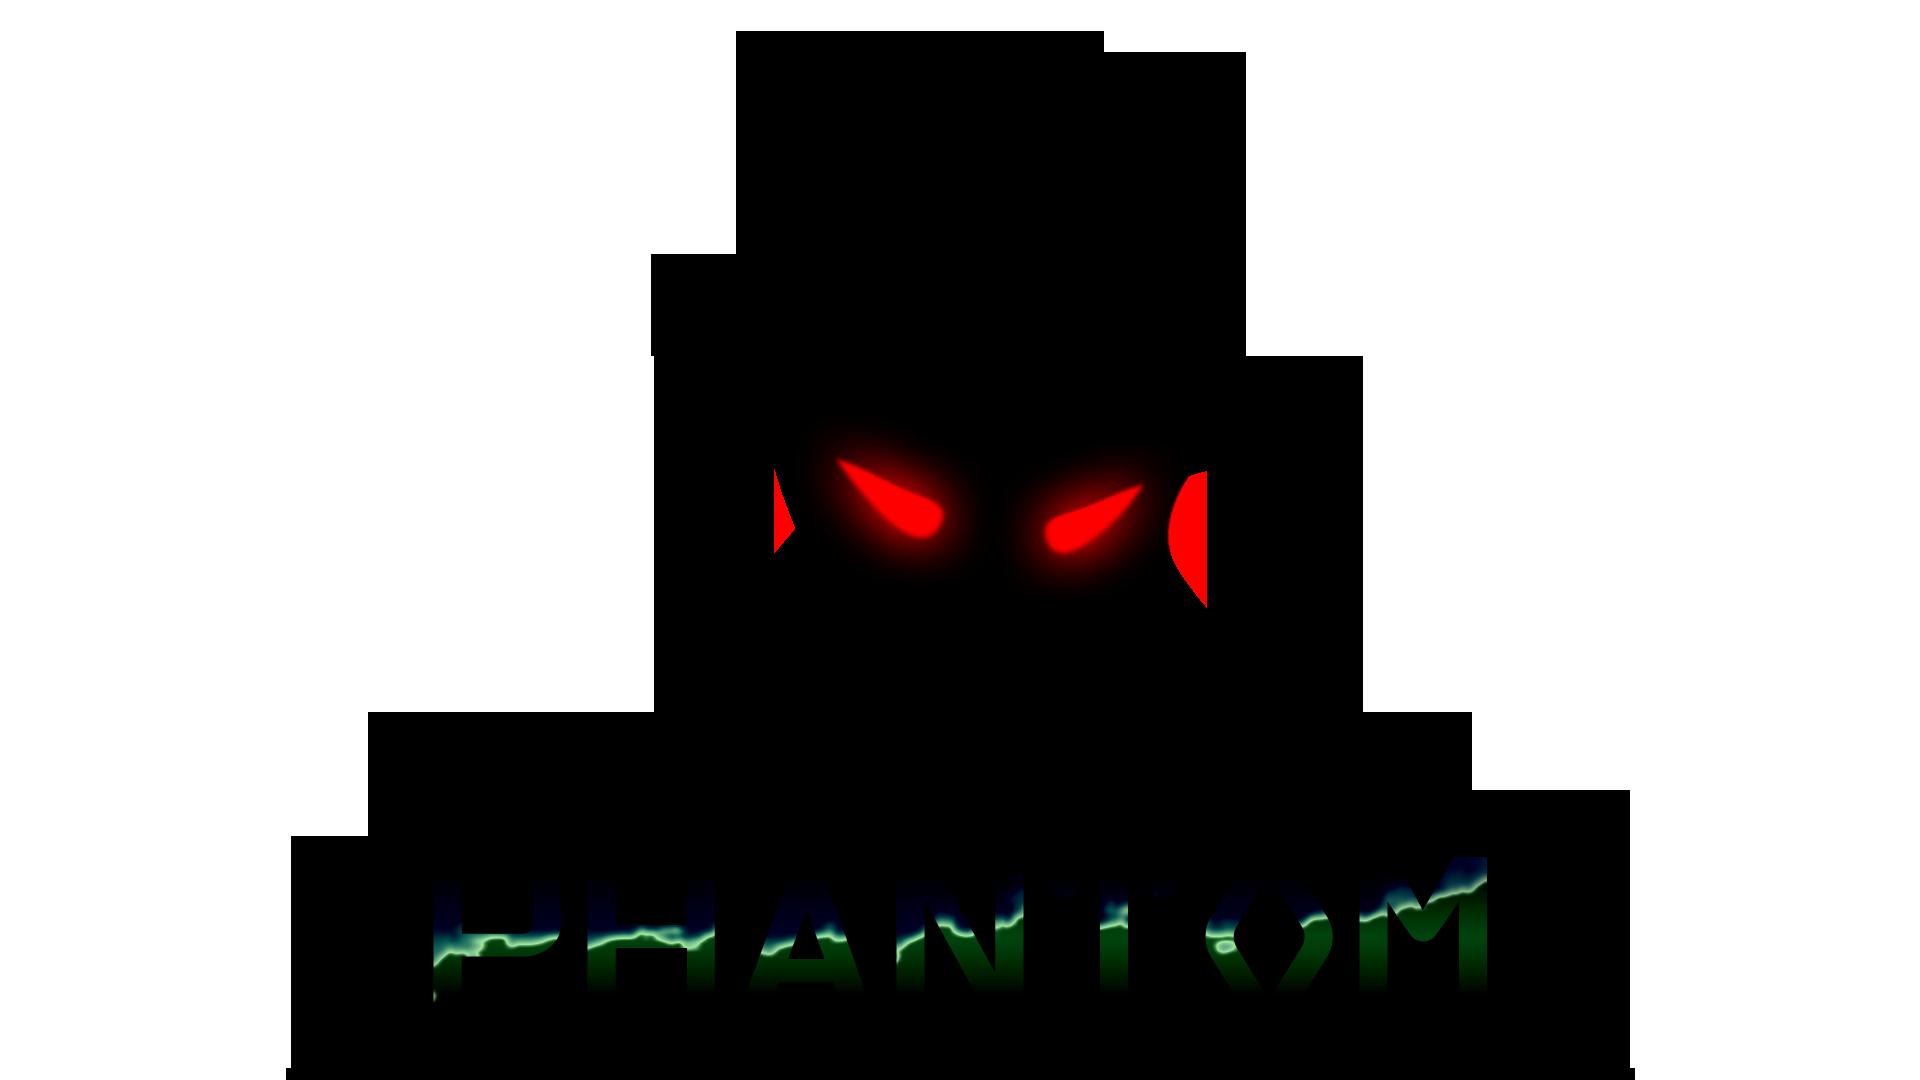 red moon phantom - photo #43